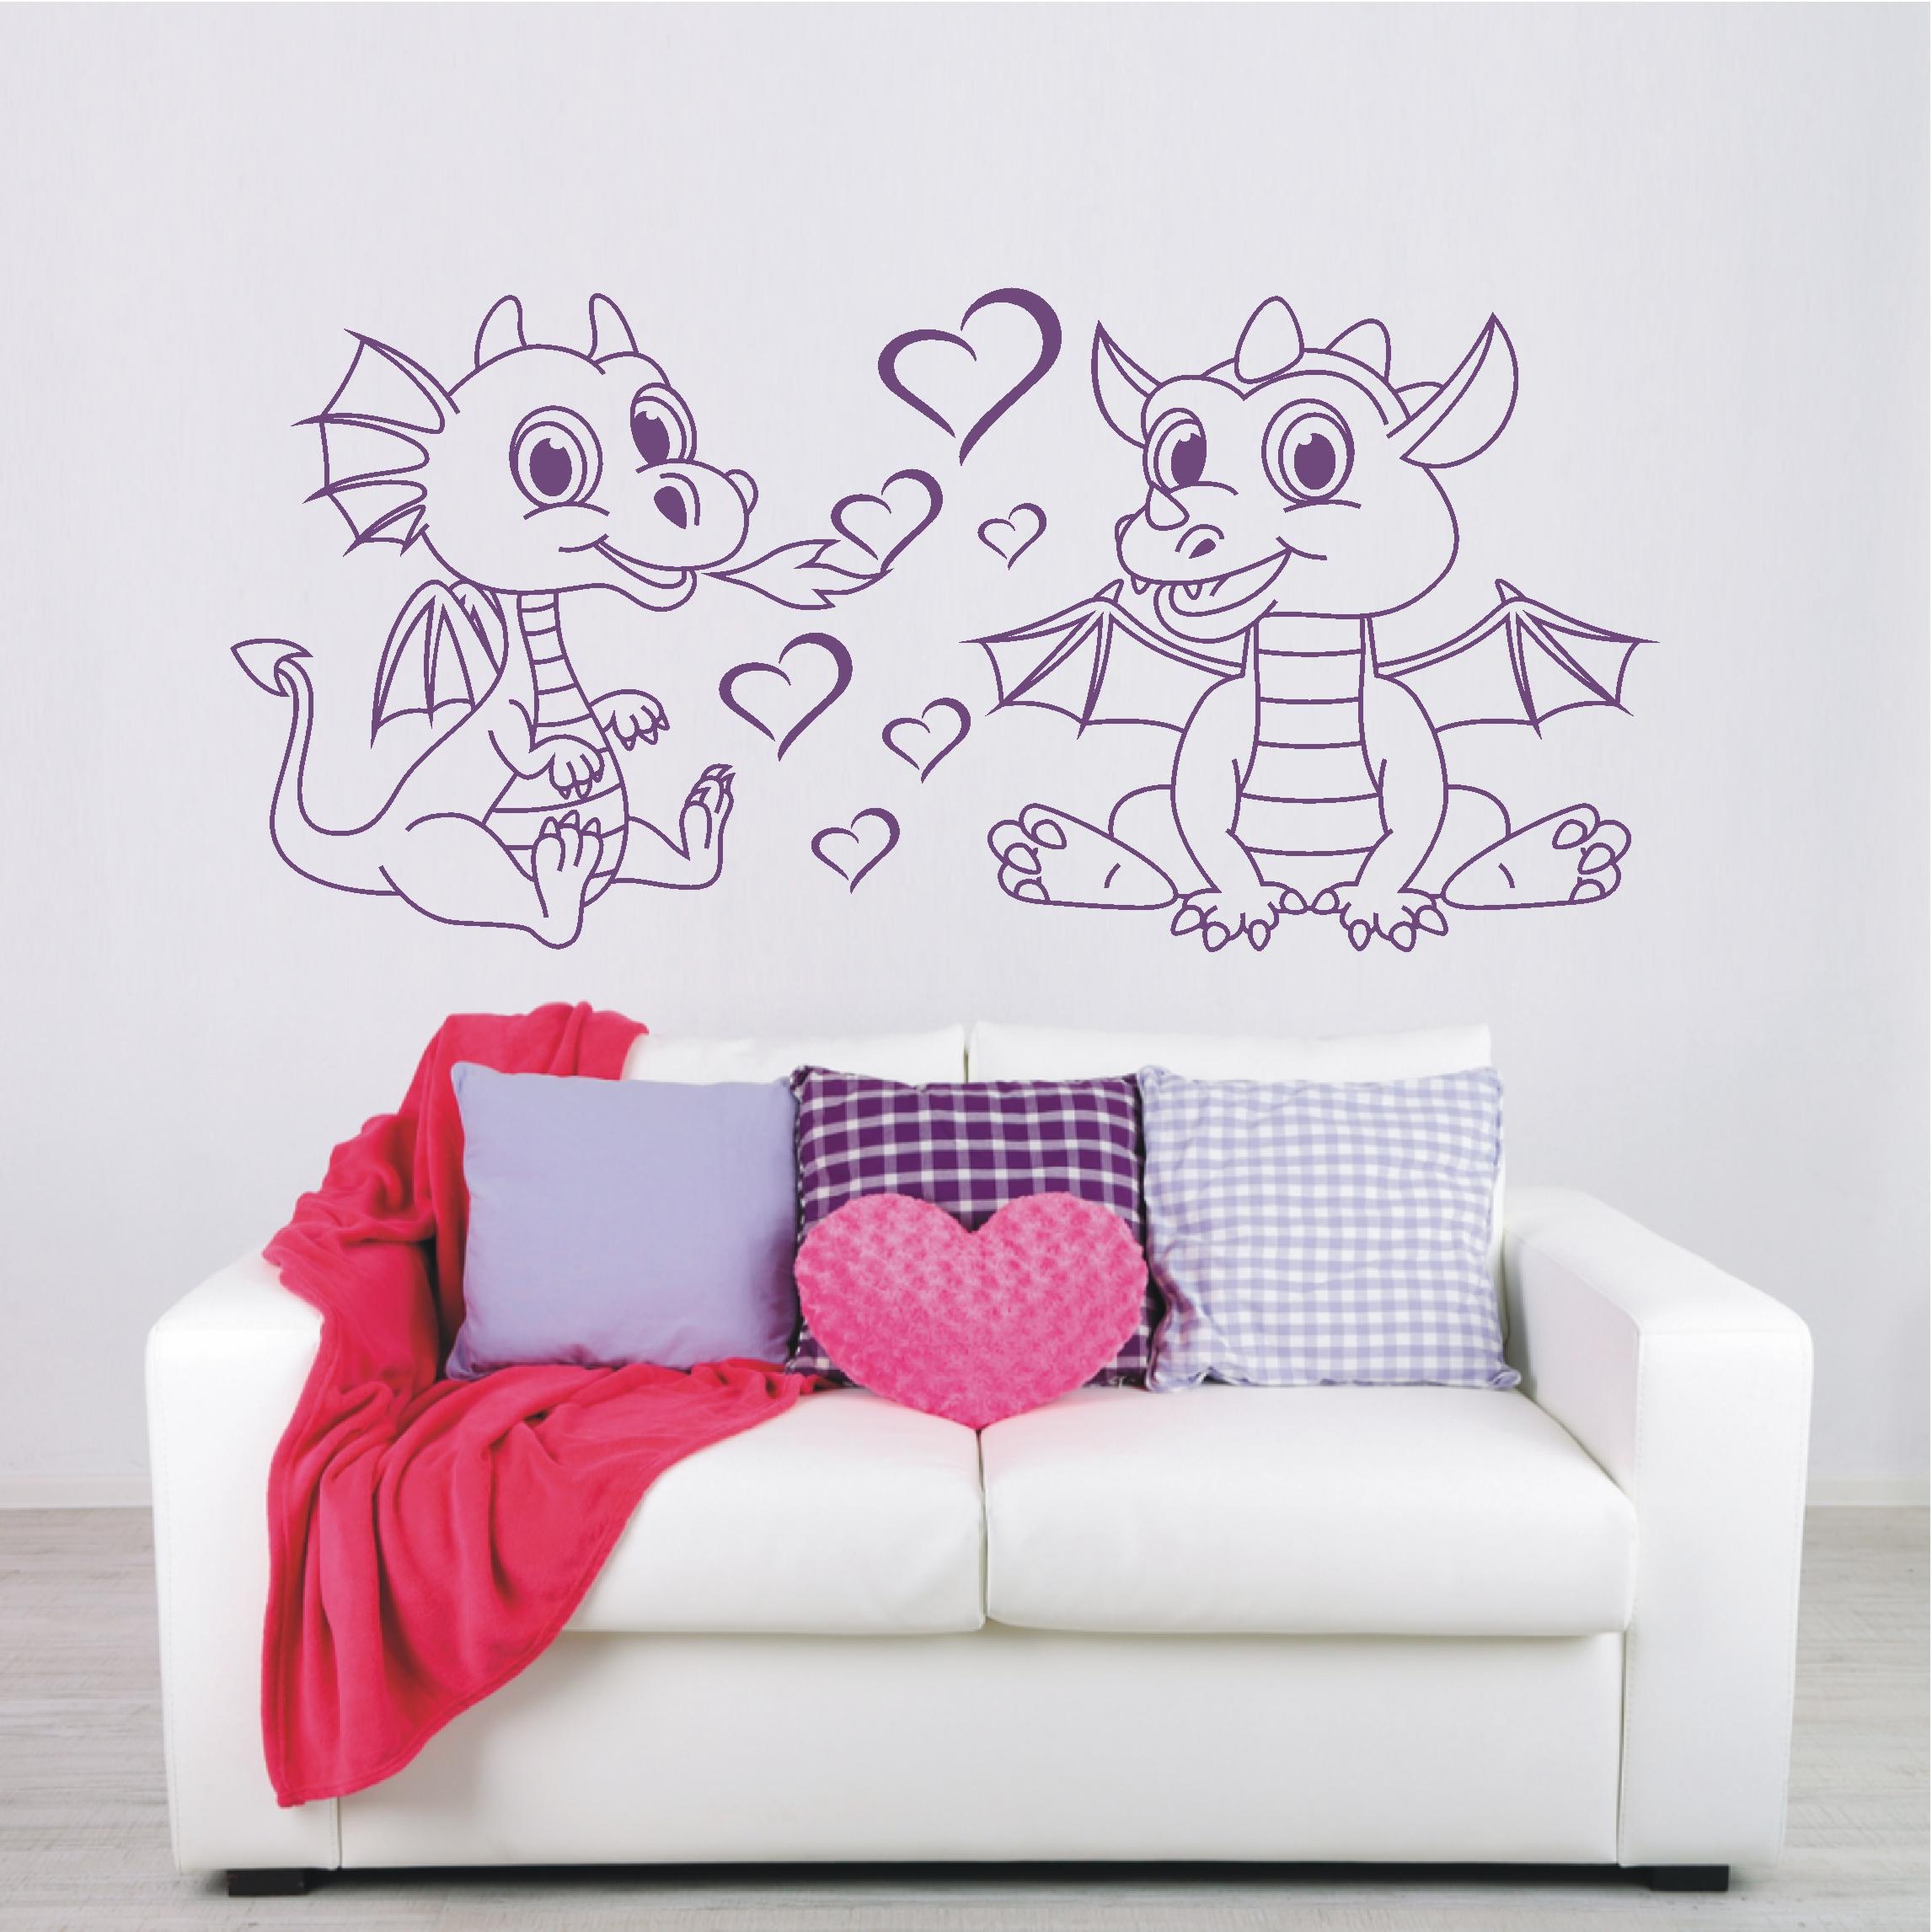 wandtattoo wandaufkleber herzen drachen babys drache. Black Bedroom Furniture Sets. Home Design Ideas